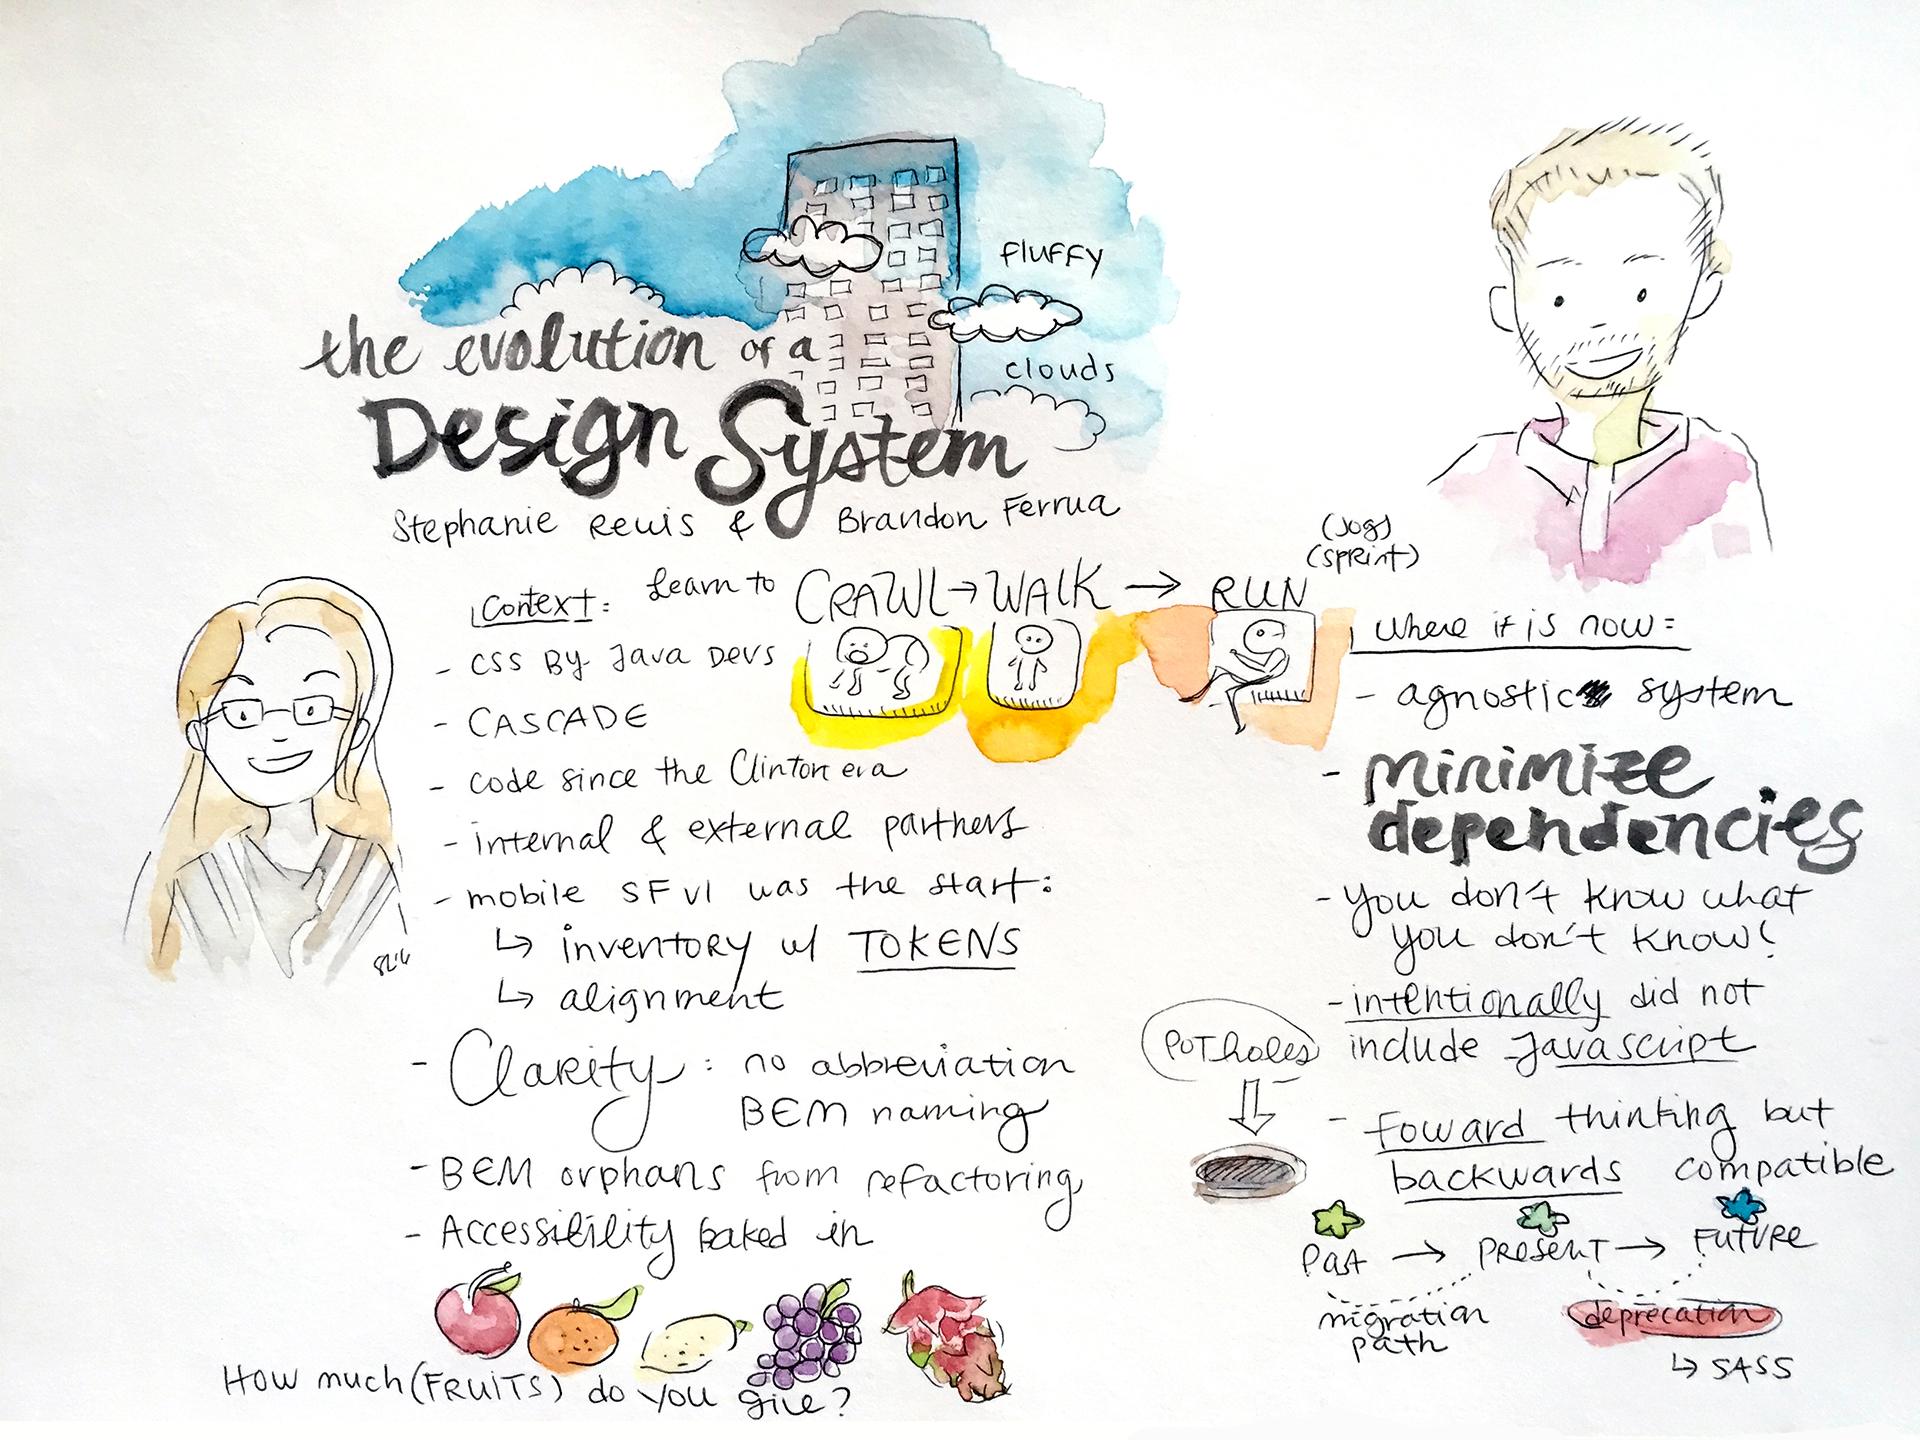 Crawl, Walk, Run — The Evolution of a Design System